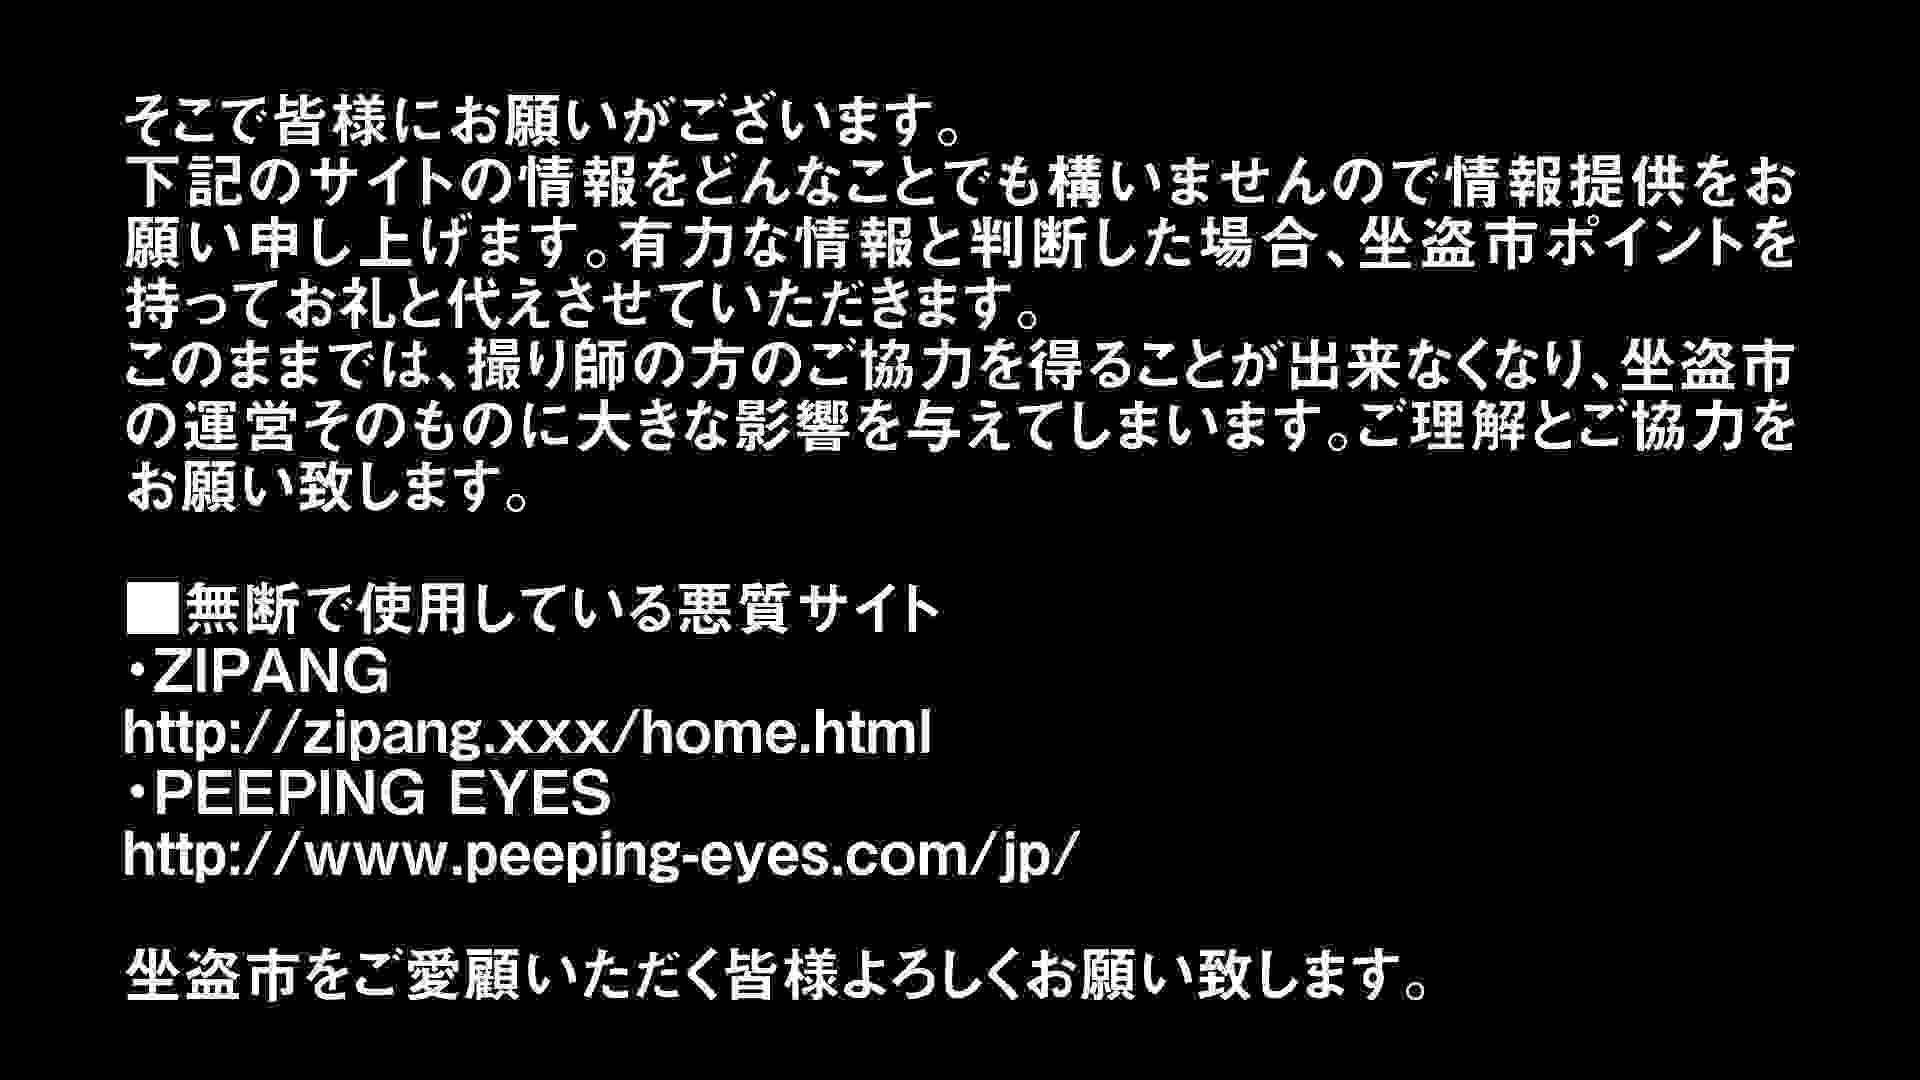 Aquaな露天風呂Vol.297 OLセックス 隠し撮りオマンコ動画紹介 103画像 41